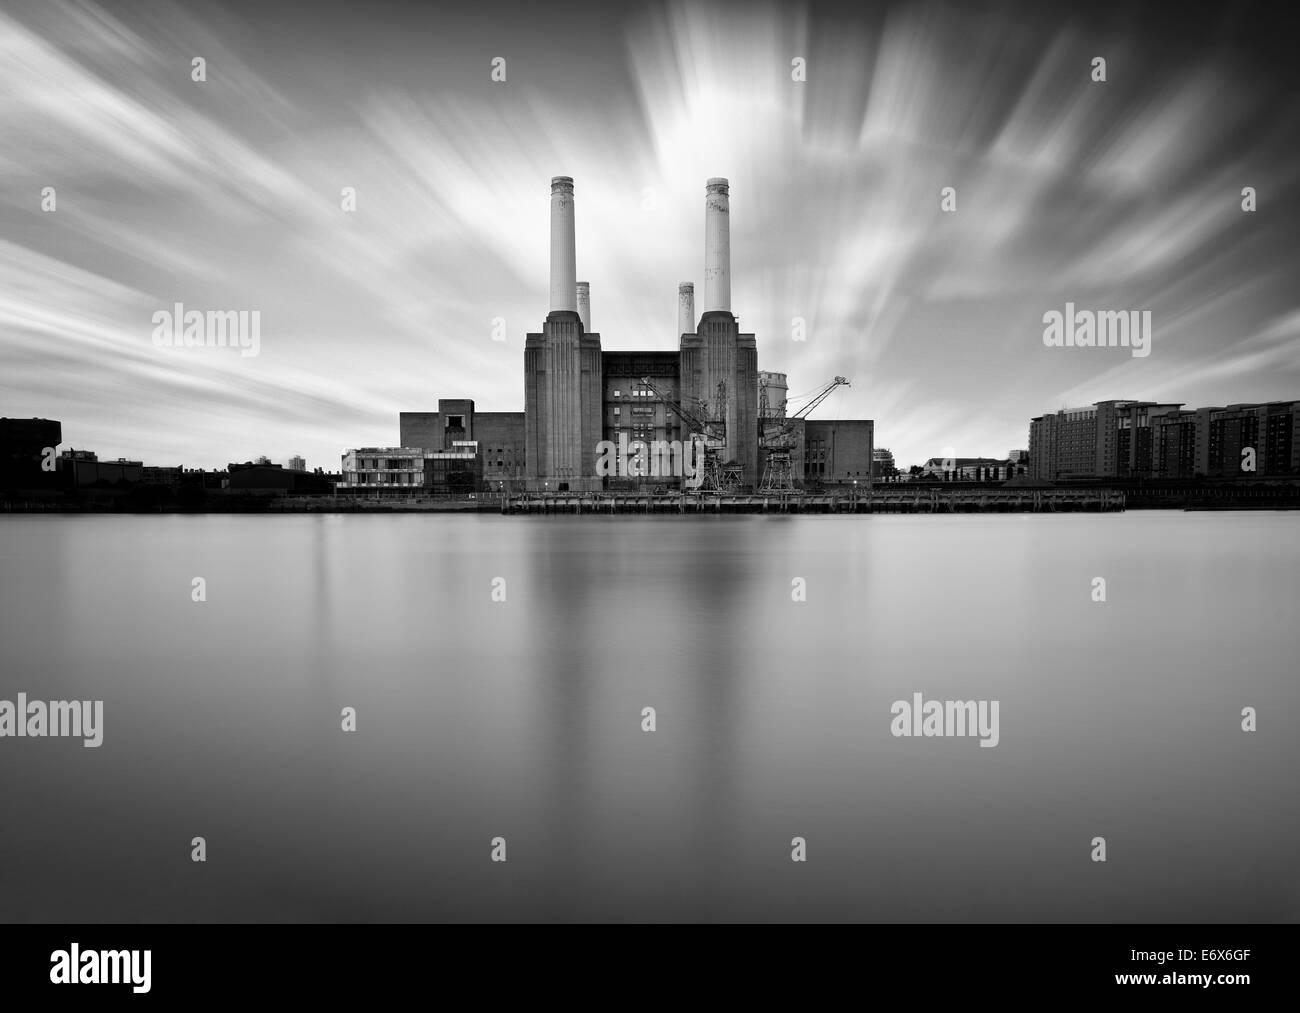 battersea power station, long exposure. credit: LEE RAMSDEN / ALAMY - Stock Image